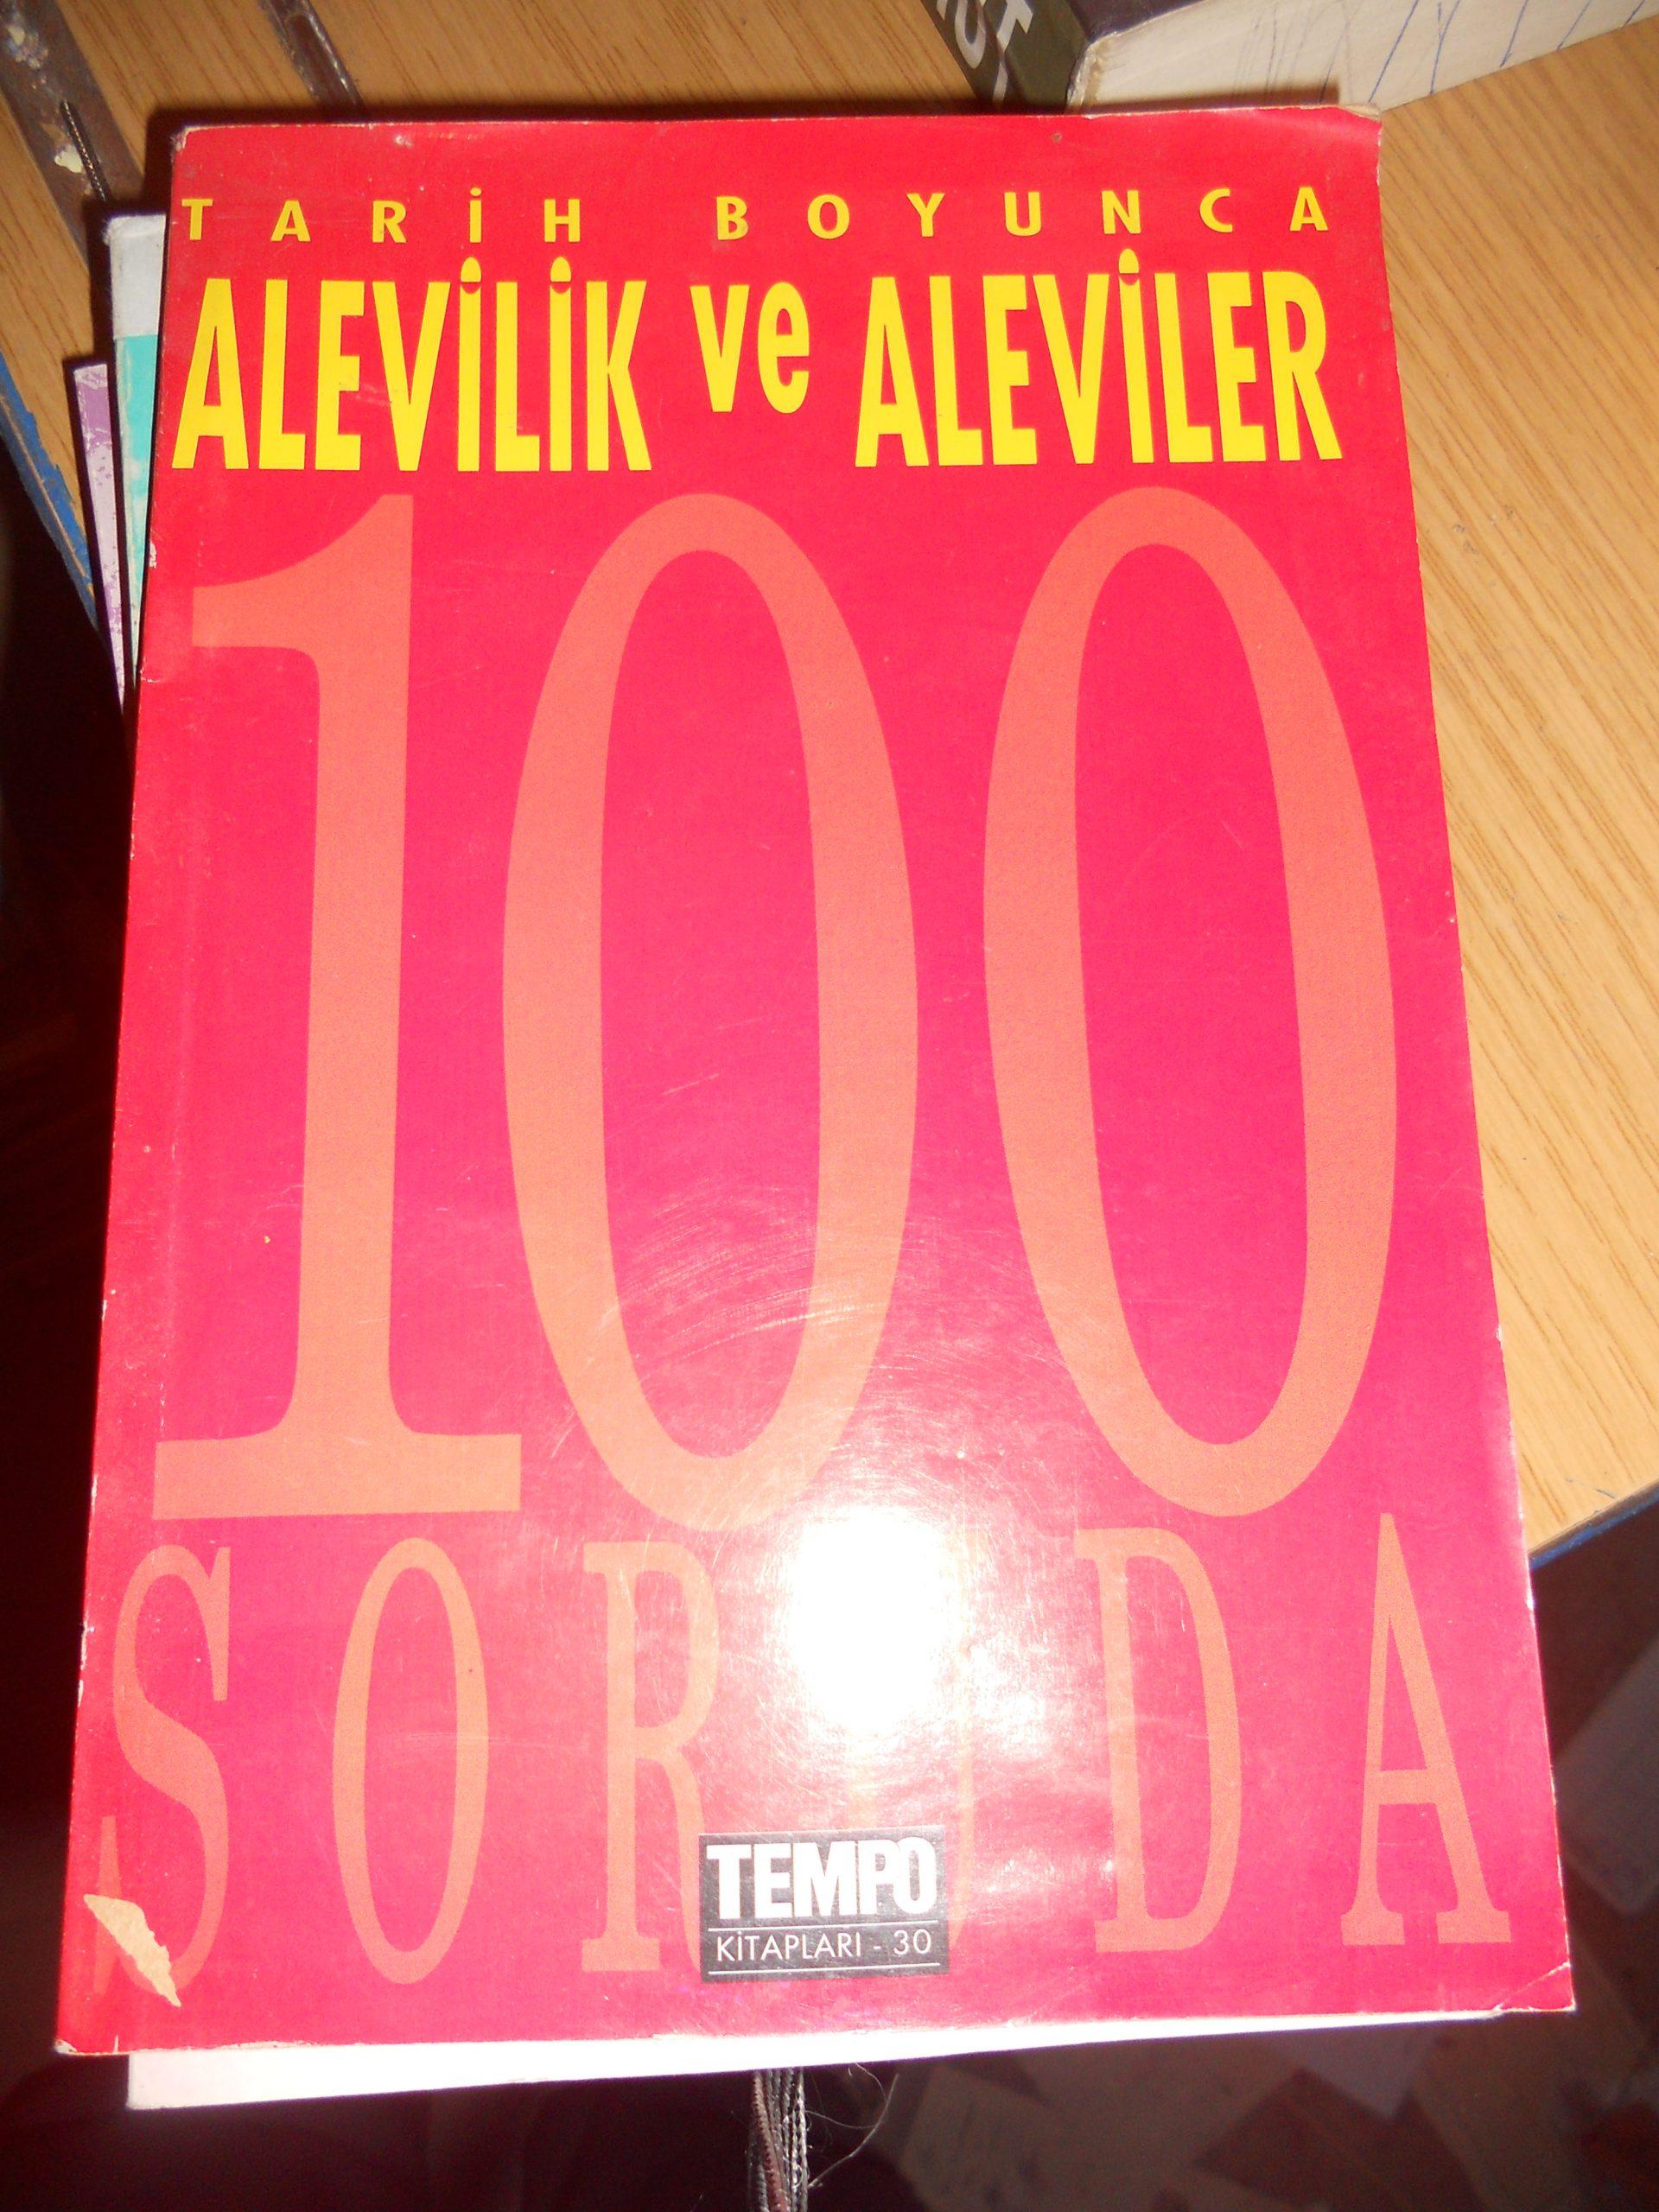 100 SorudaTarih Boyunca ALEVİLİK ve ALEVİLER /LEVENT CİNEMRE & FİGEN AKŞİT/ 10 tl